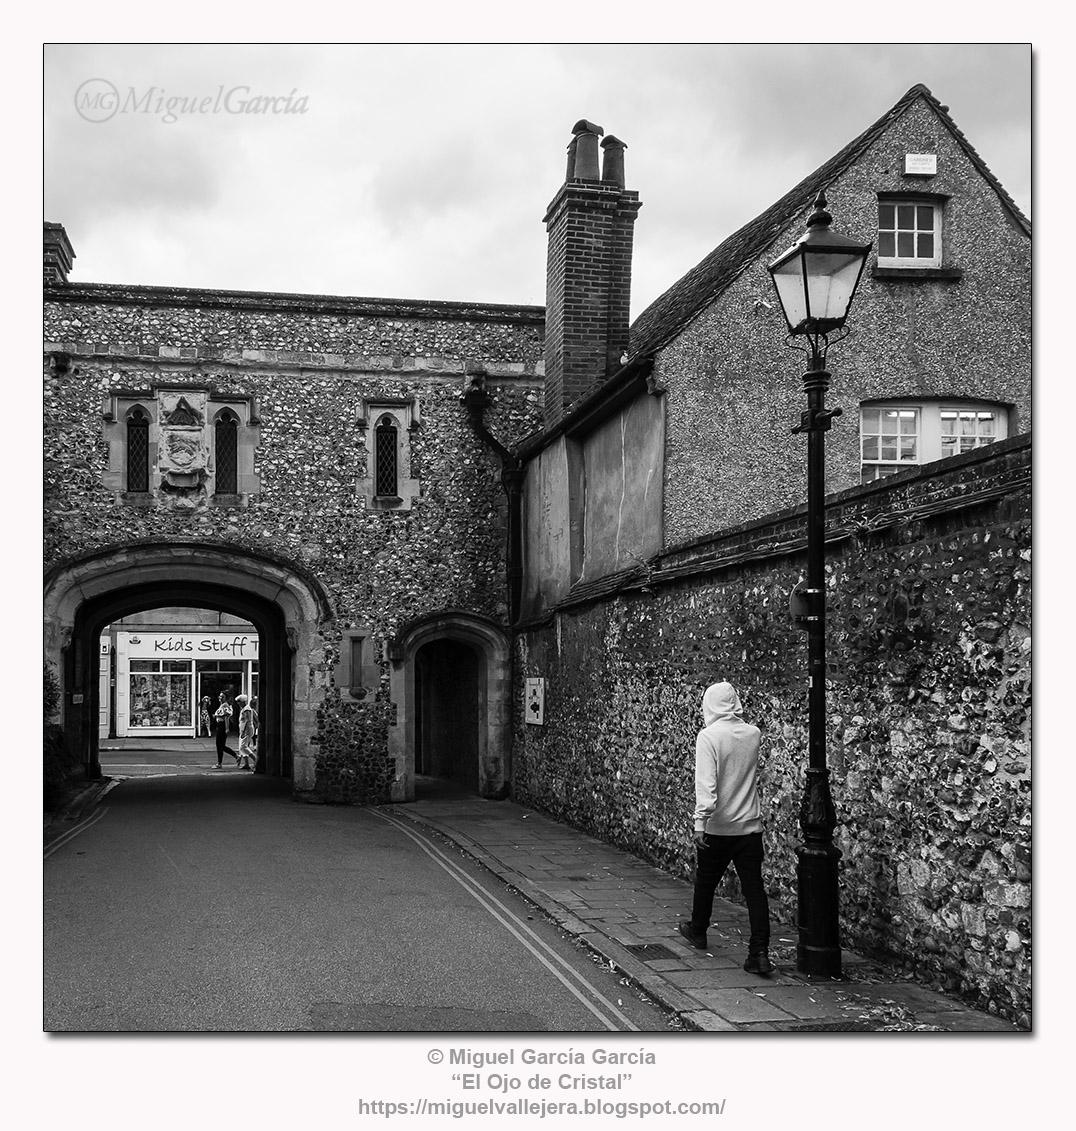 Canon Ln., Chichester (UK)